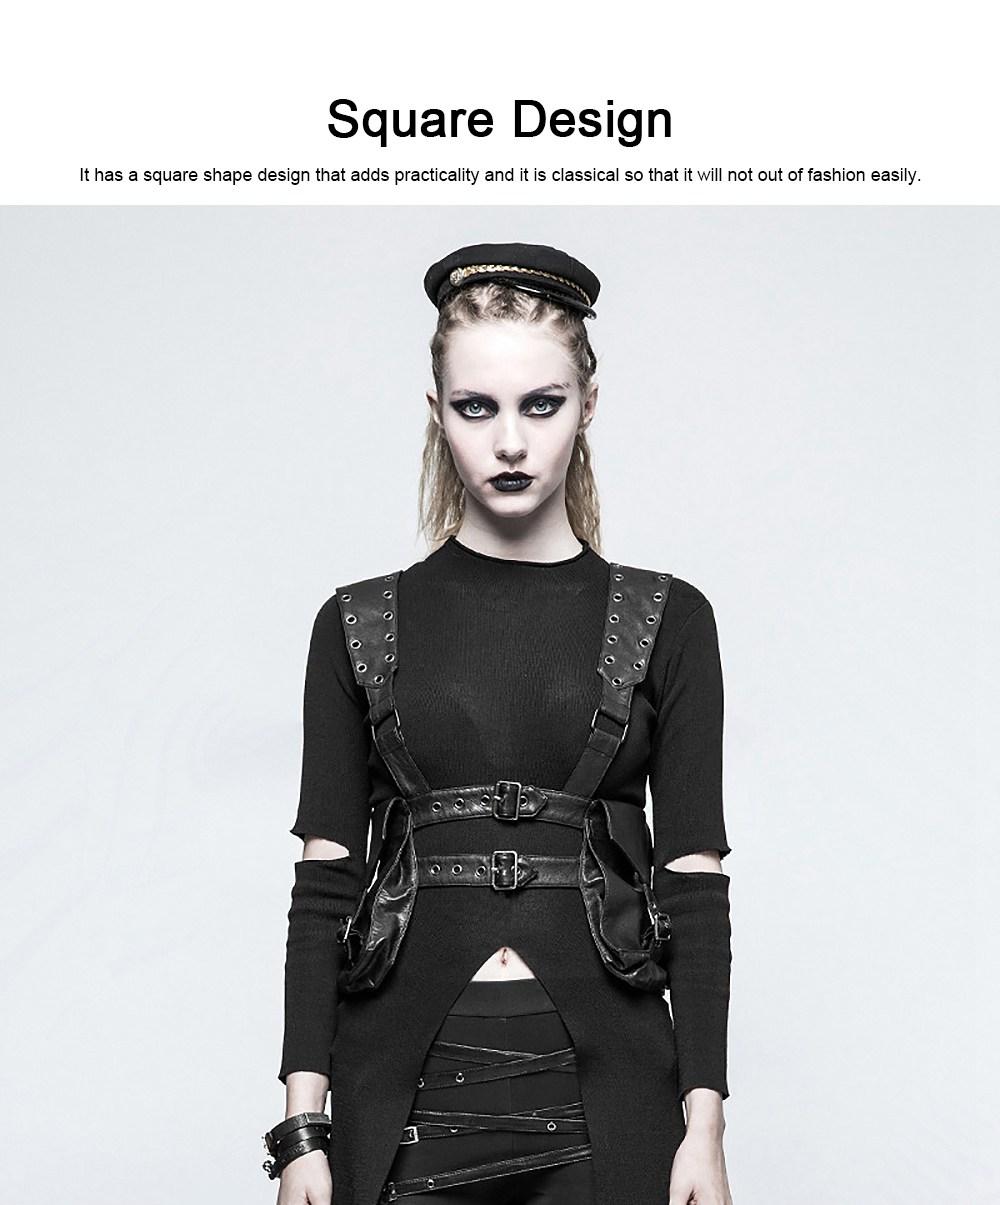 Square Shape Waist Strap Adjustable Belt Backpack, Locomotive Style Bag for Women, PU Leather Waistcoat Halloween Gift 3